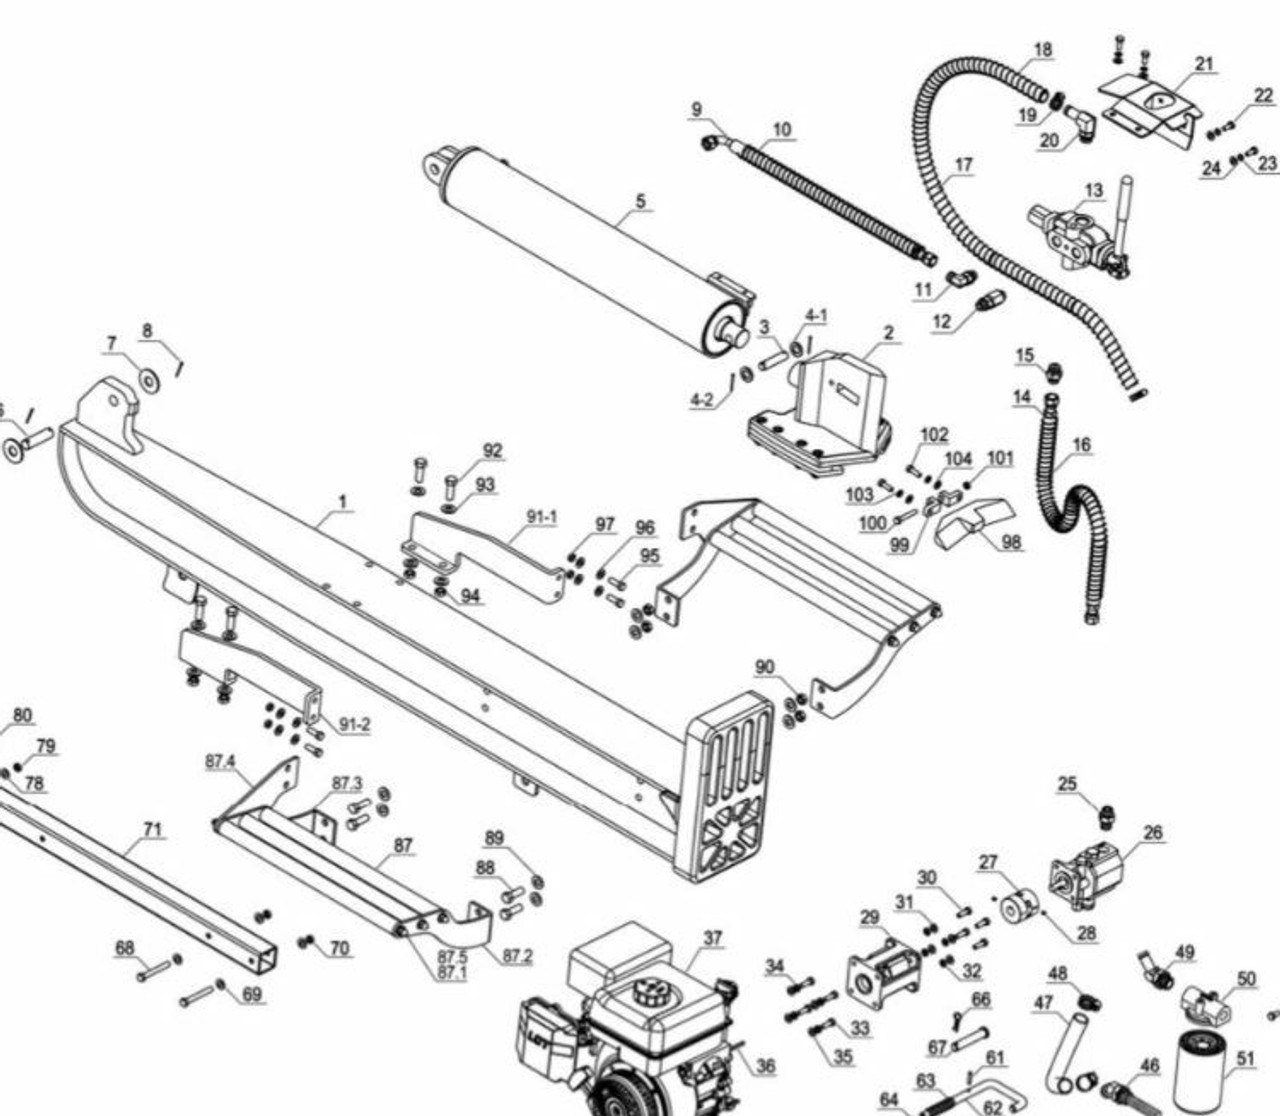 Log Splitter Parts